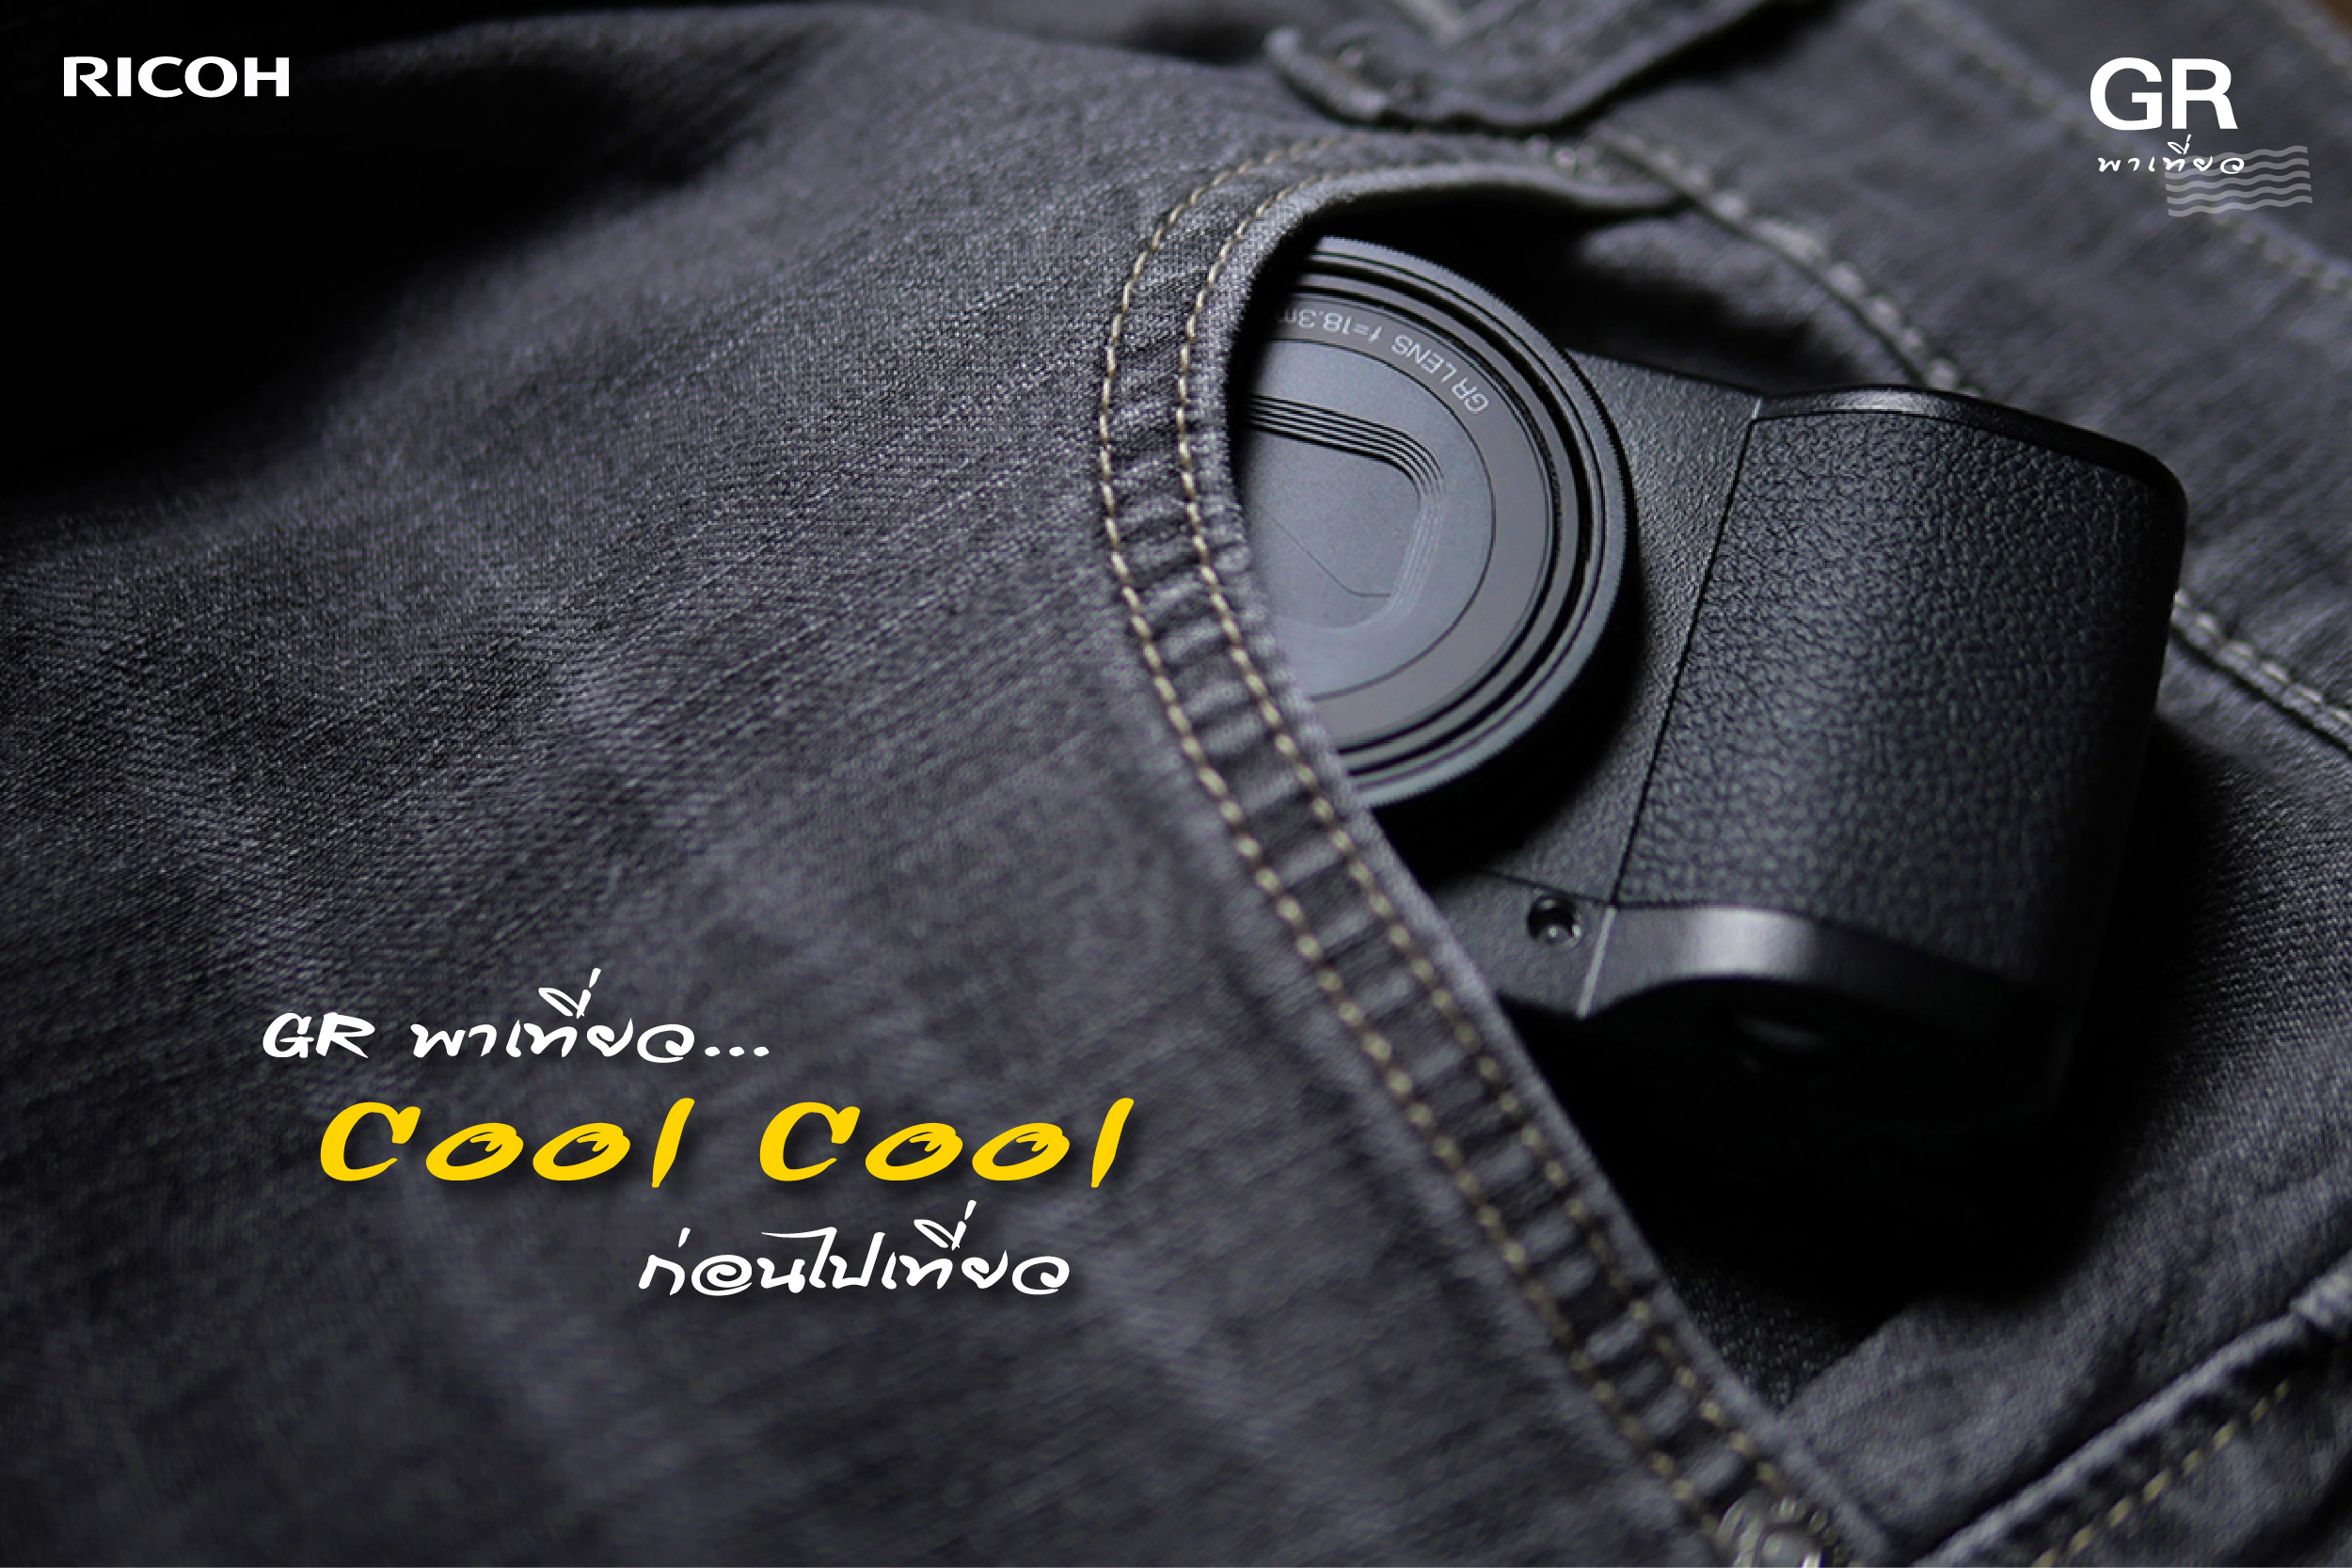 RICOH GR พาเที่ยว… Cool Cool ก่อนไปเที่ยว